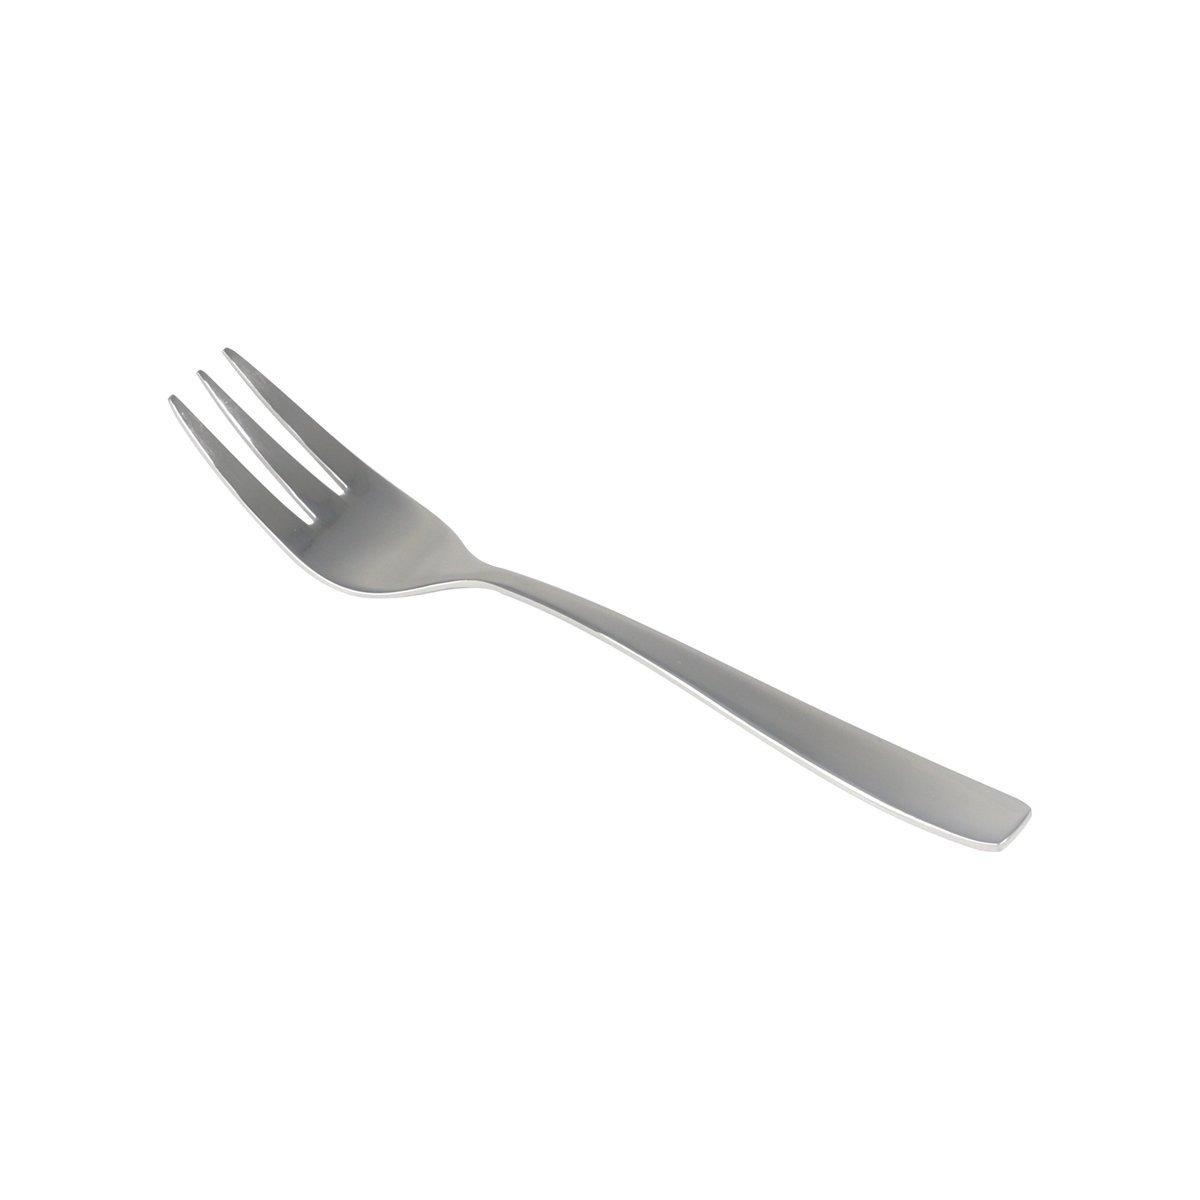 Jogo 12 peças garfo de sobremesa de aço inox Pisa Wolff - 71163